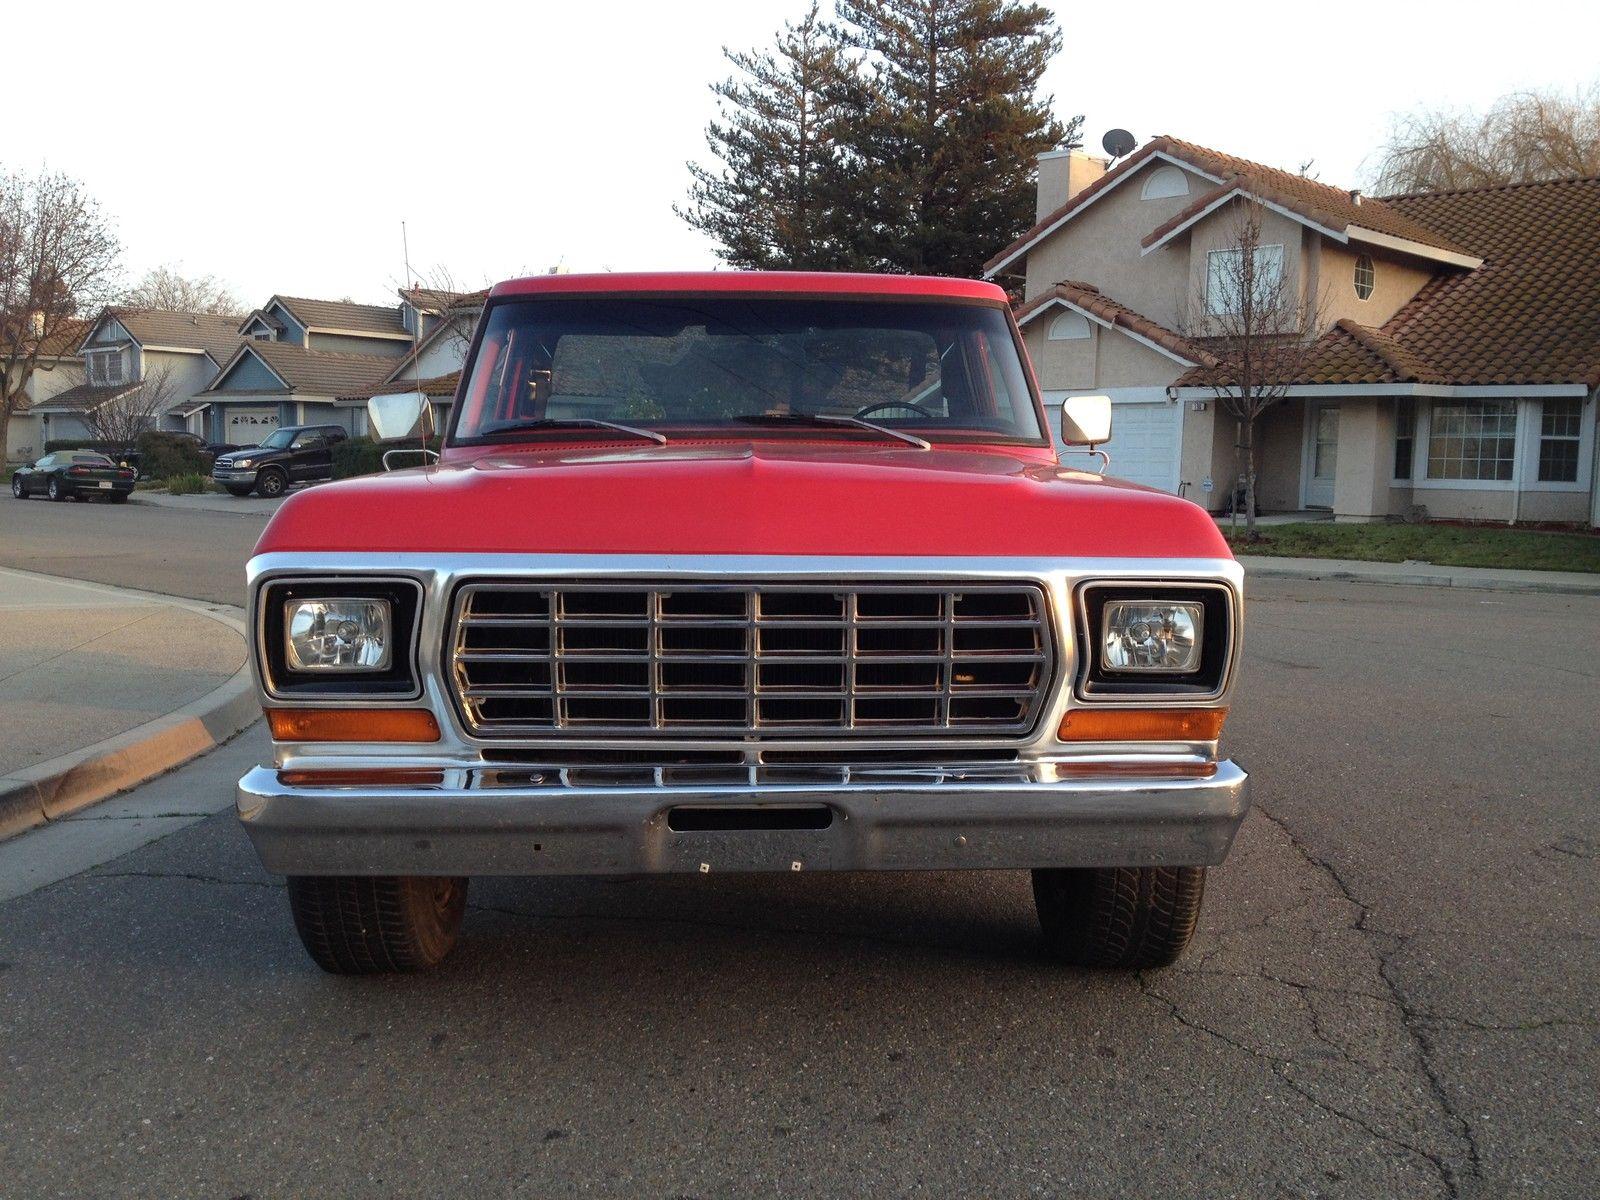 1979 Ford F100 Step Side Very Rare California No Rust Reserve 1955 Prevnext